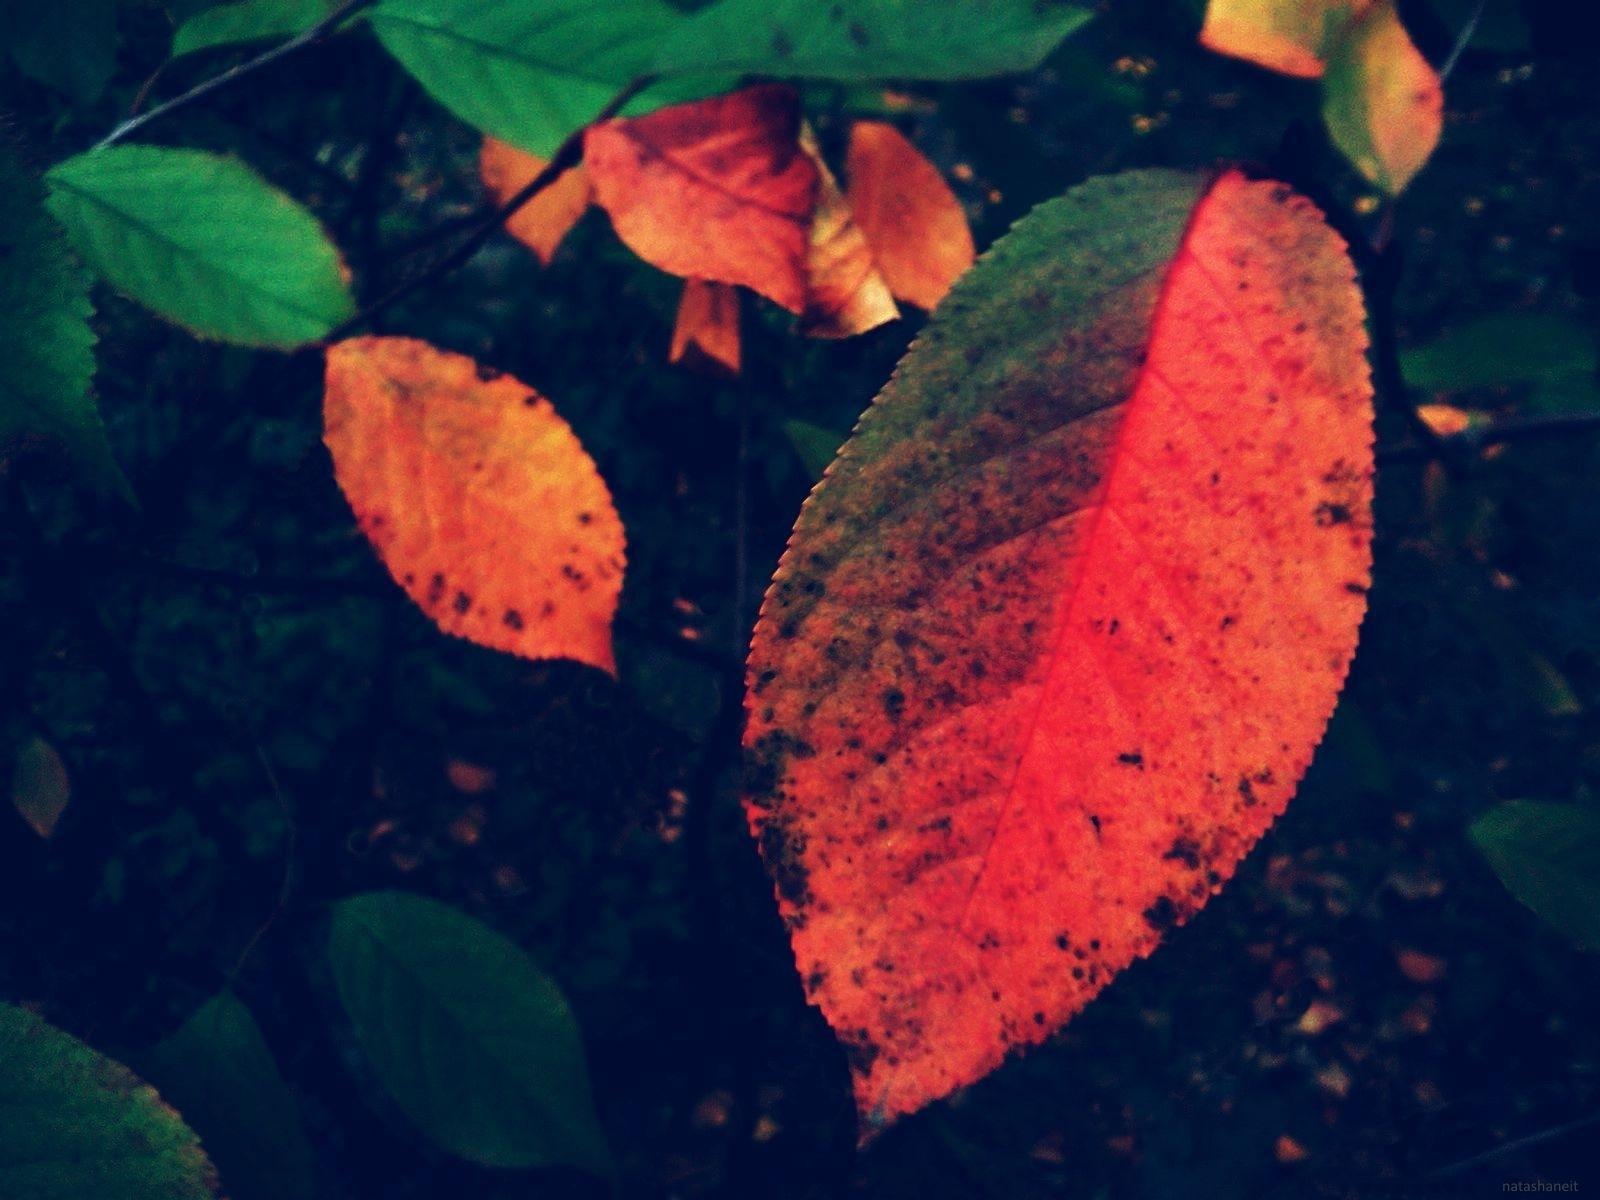 Autumn leaves by natashaneit